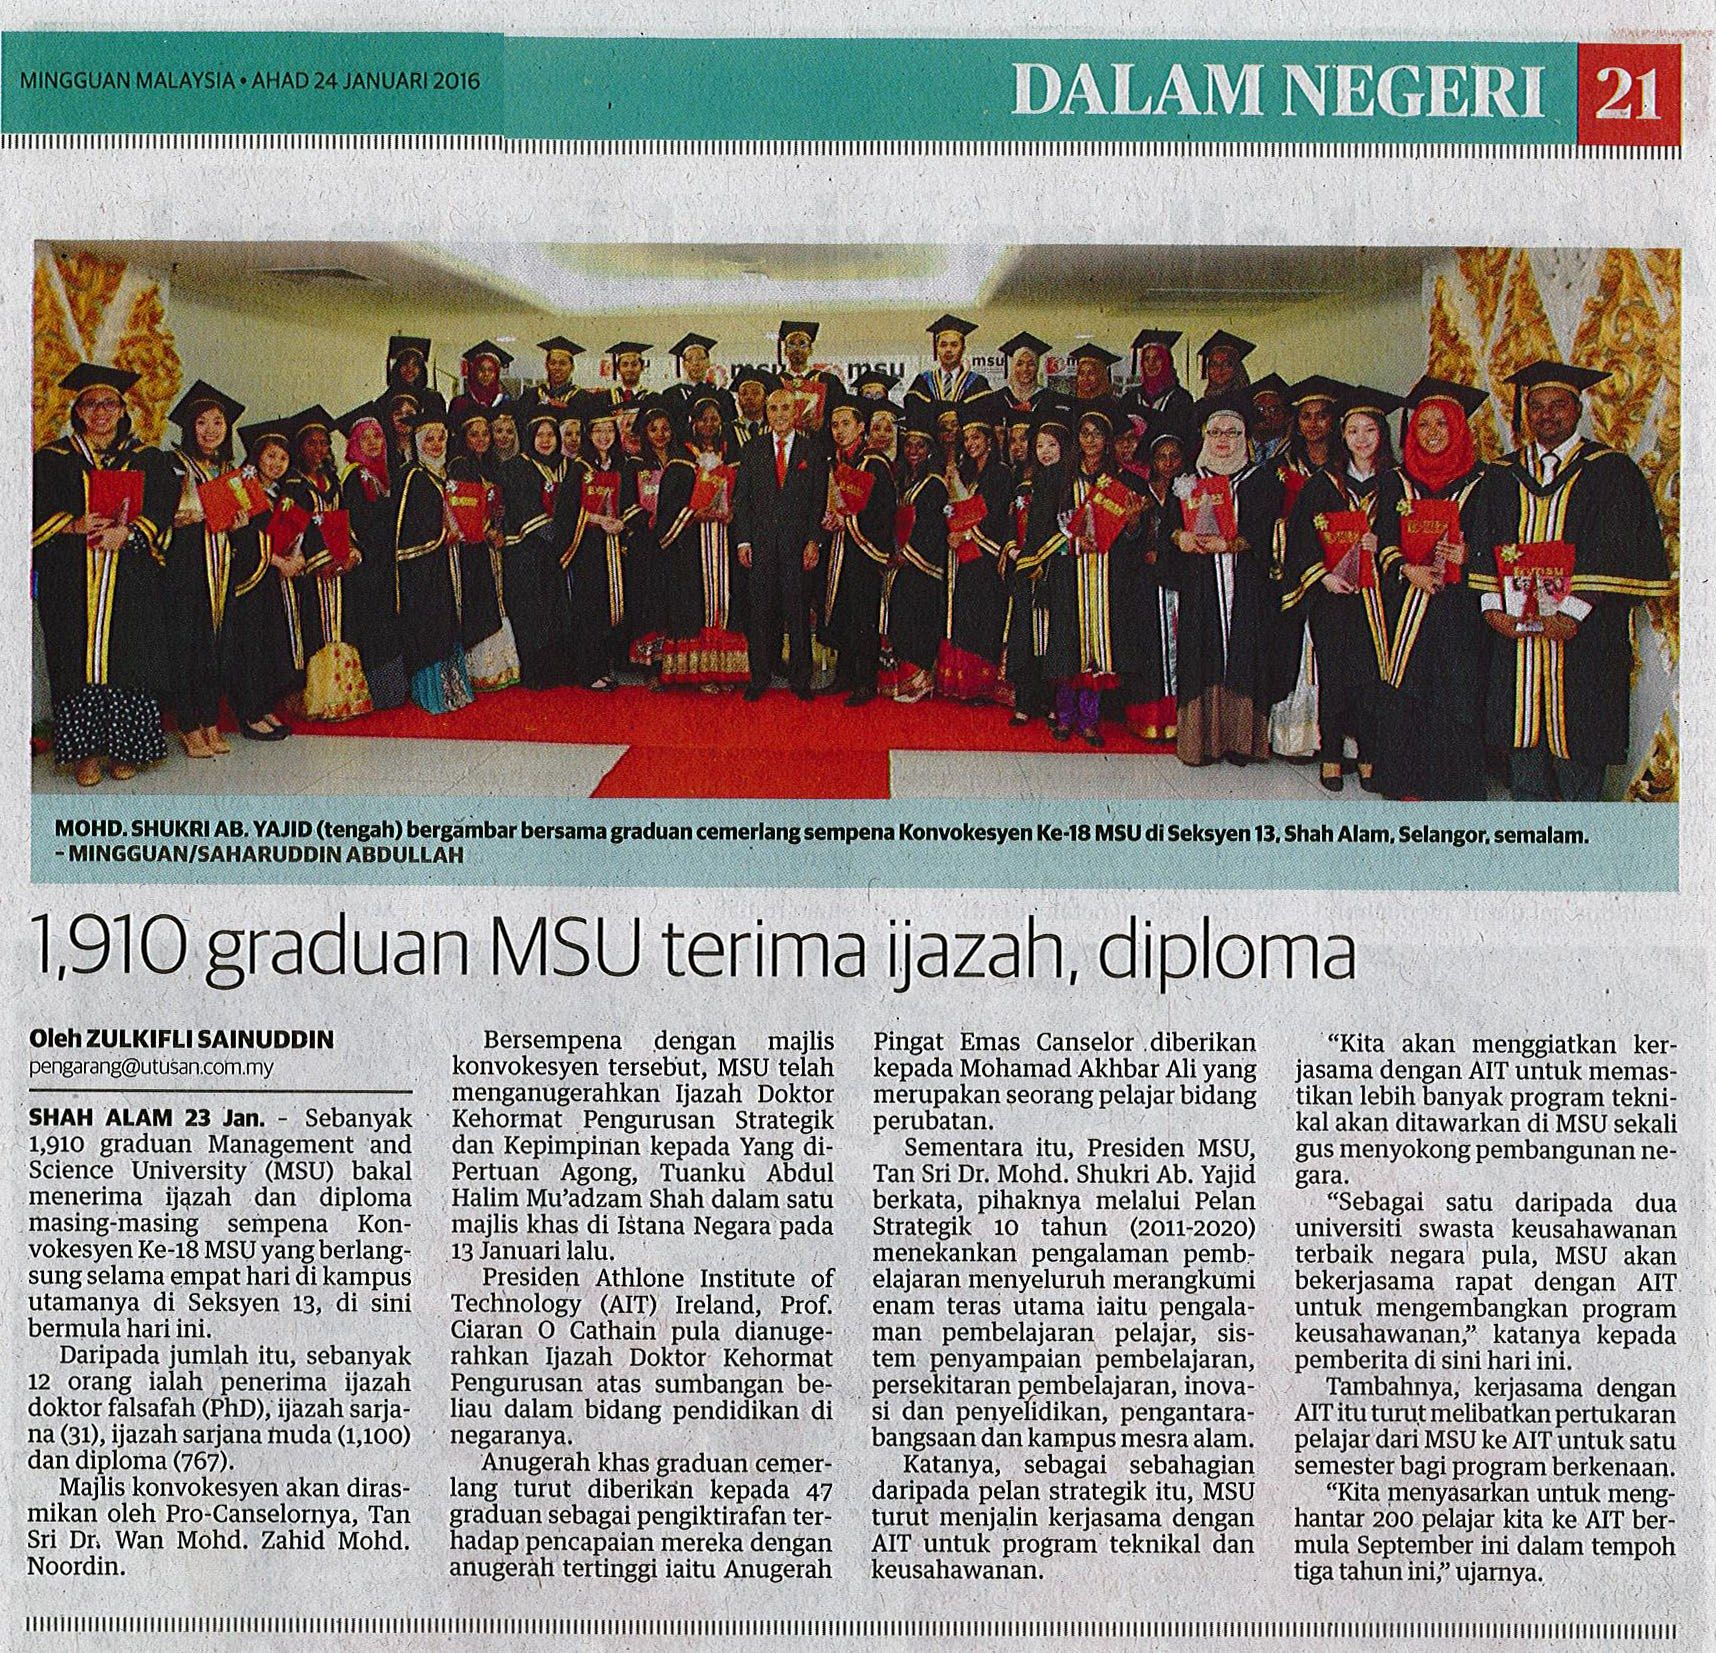 graduan msu terima ijazah dan diploma di majlis konvokesyen  1 910 graduan msu terima ijazah dan diploma di majlis konvokesyen ke 18